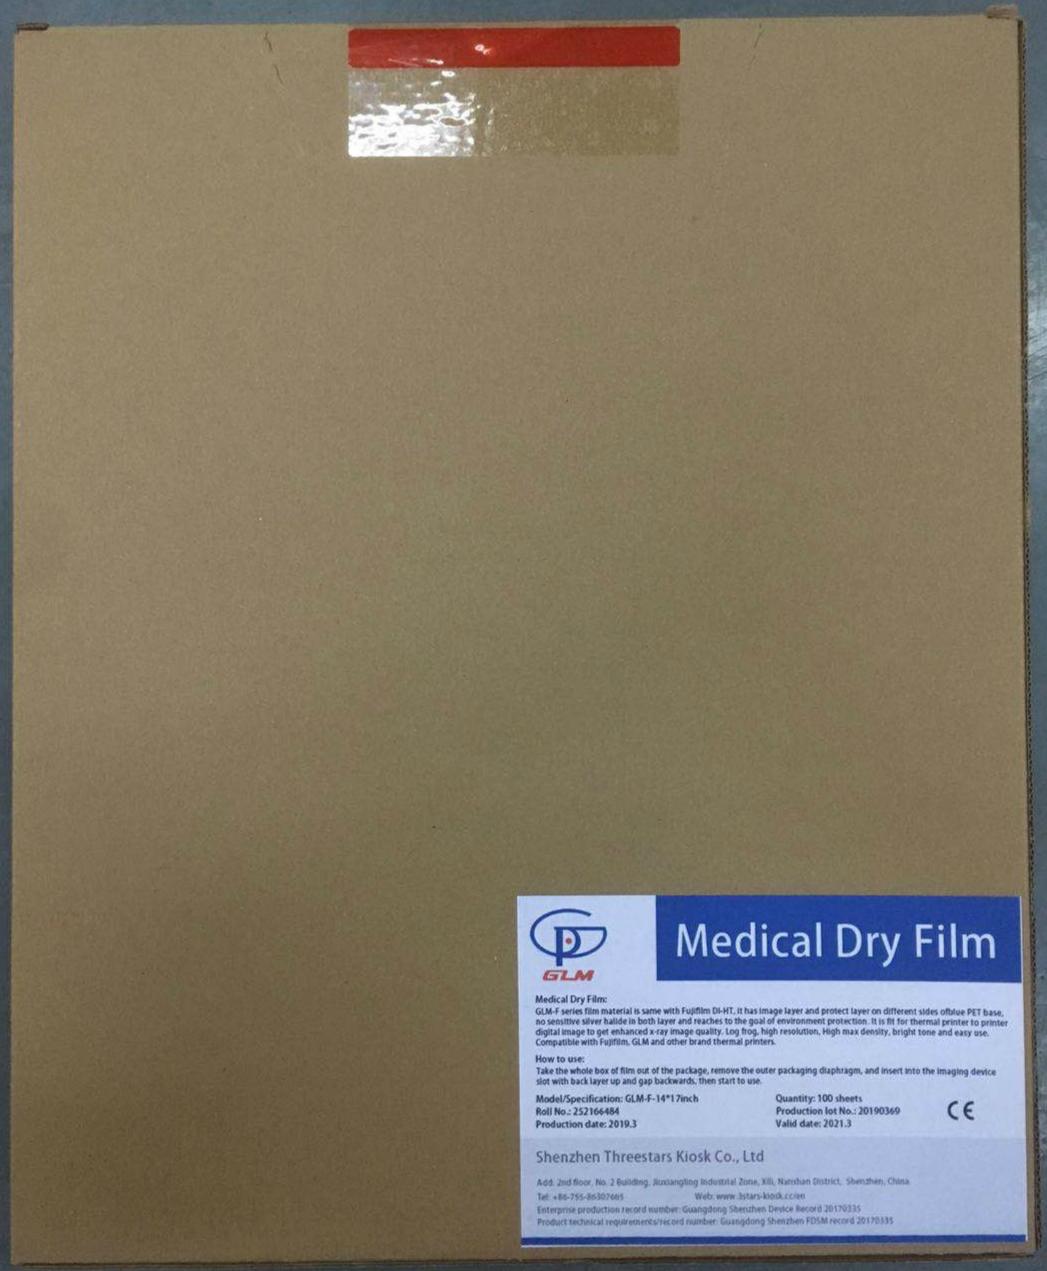 GLM Medical Thermal Imaging Film GLM-F-DIHT-10x12in